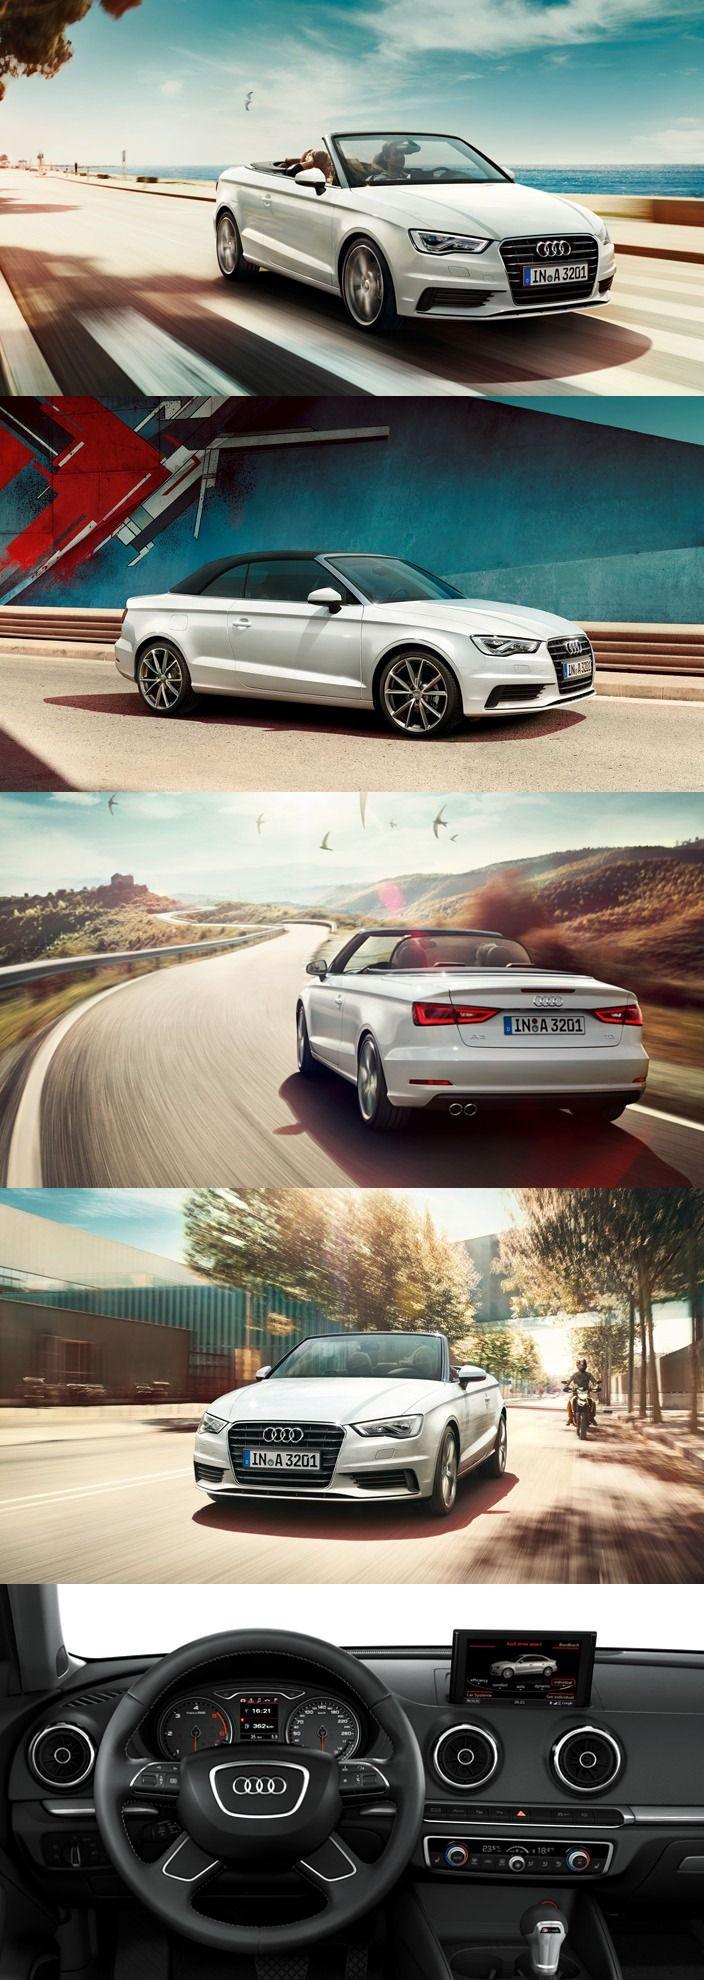 Audi A3 cabriolet 1.4 TFSI